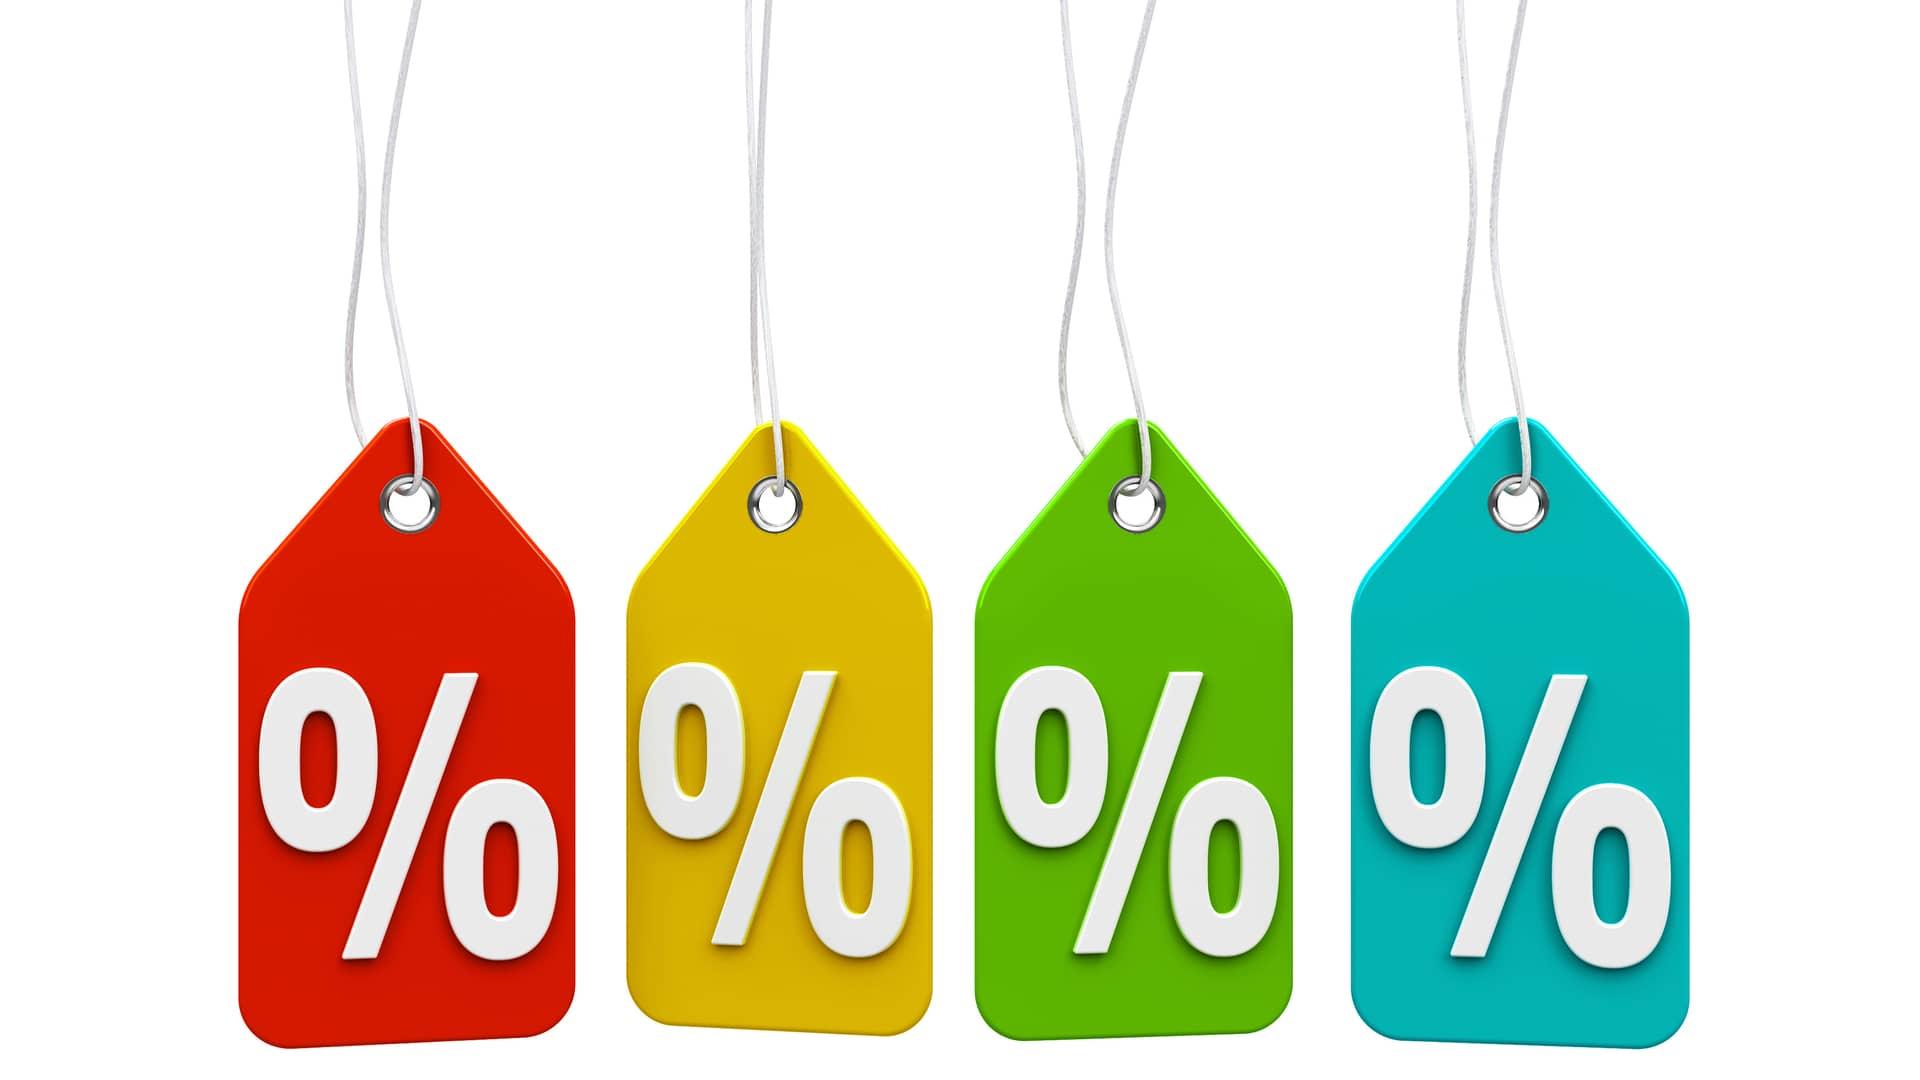 Etiquetas porcentajes simbolizan las ofertas de guuk